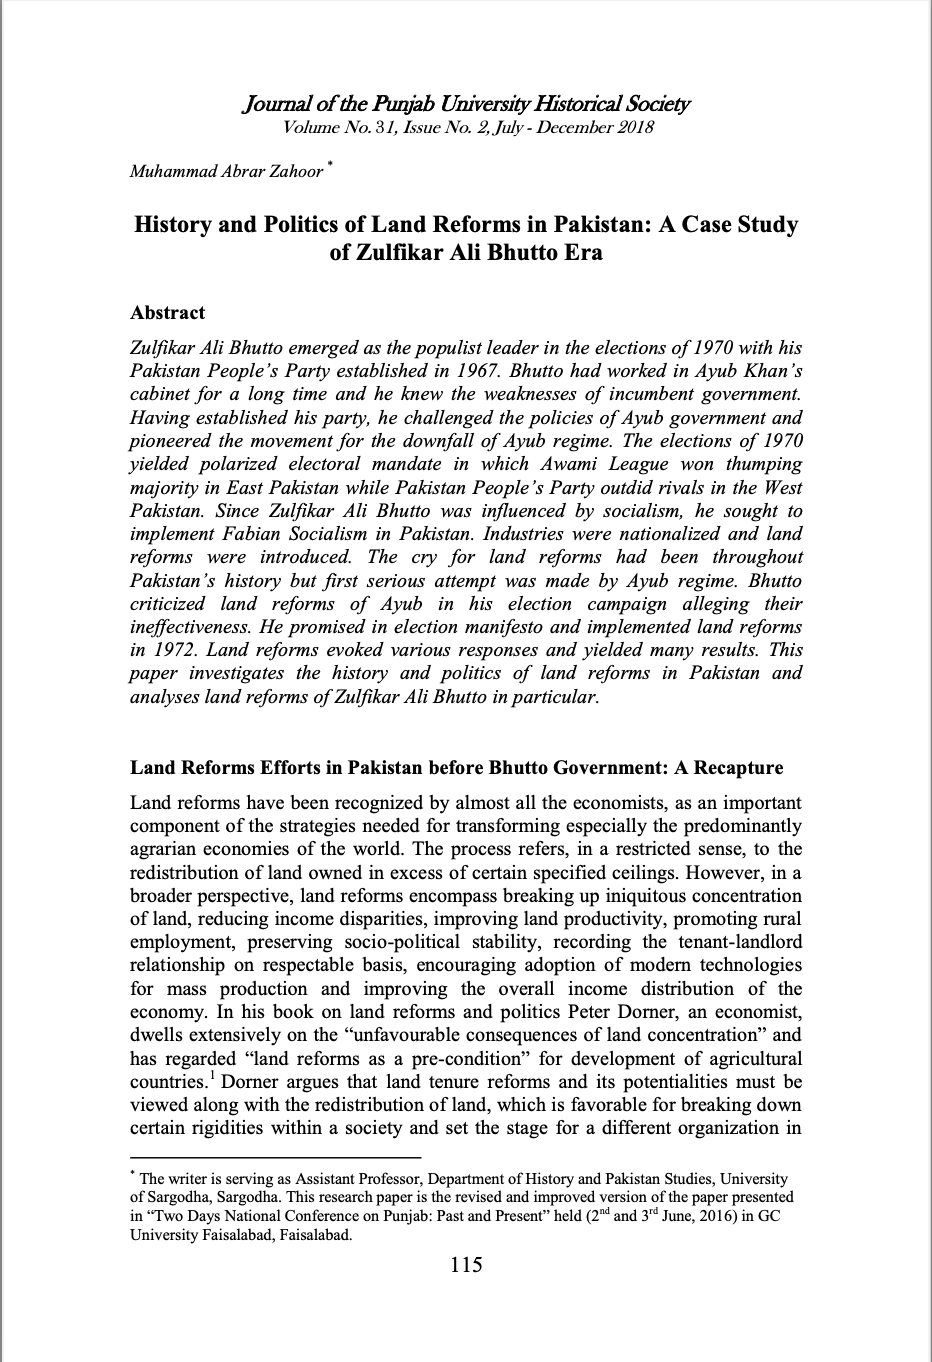 History and Politics of Land Reforms in Pakistan: A Case Study of Zulfikar Ali Bhutto Era